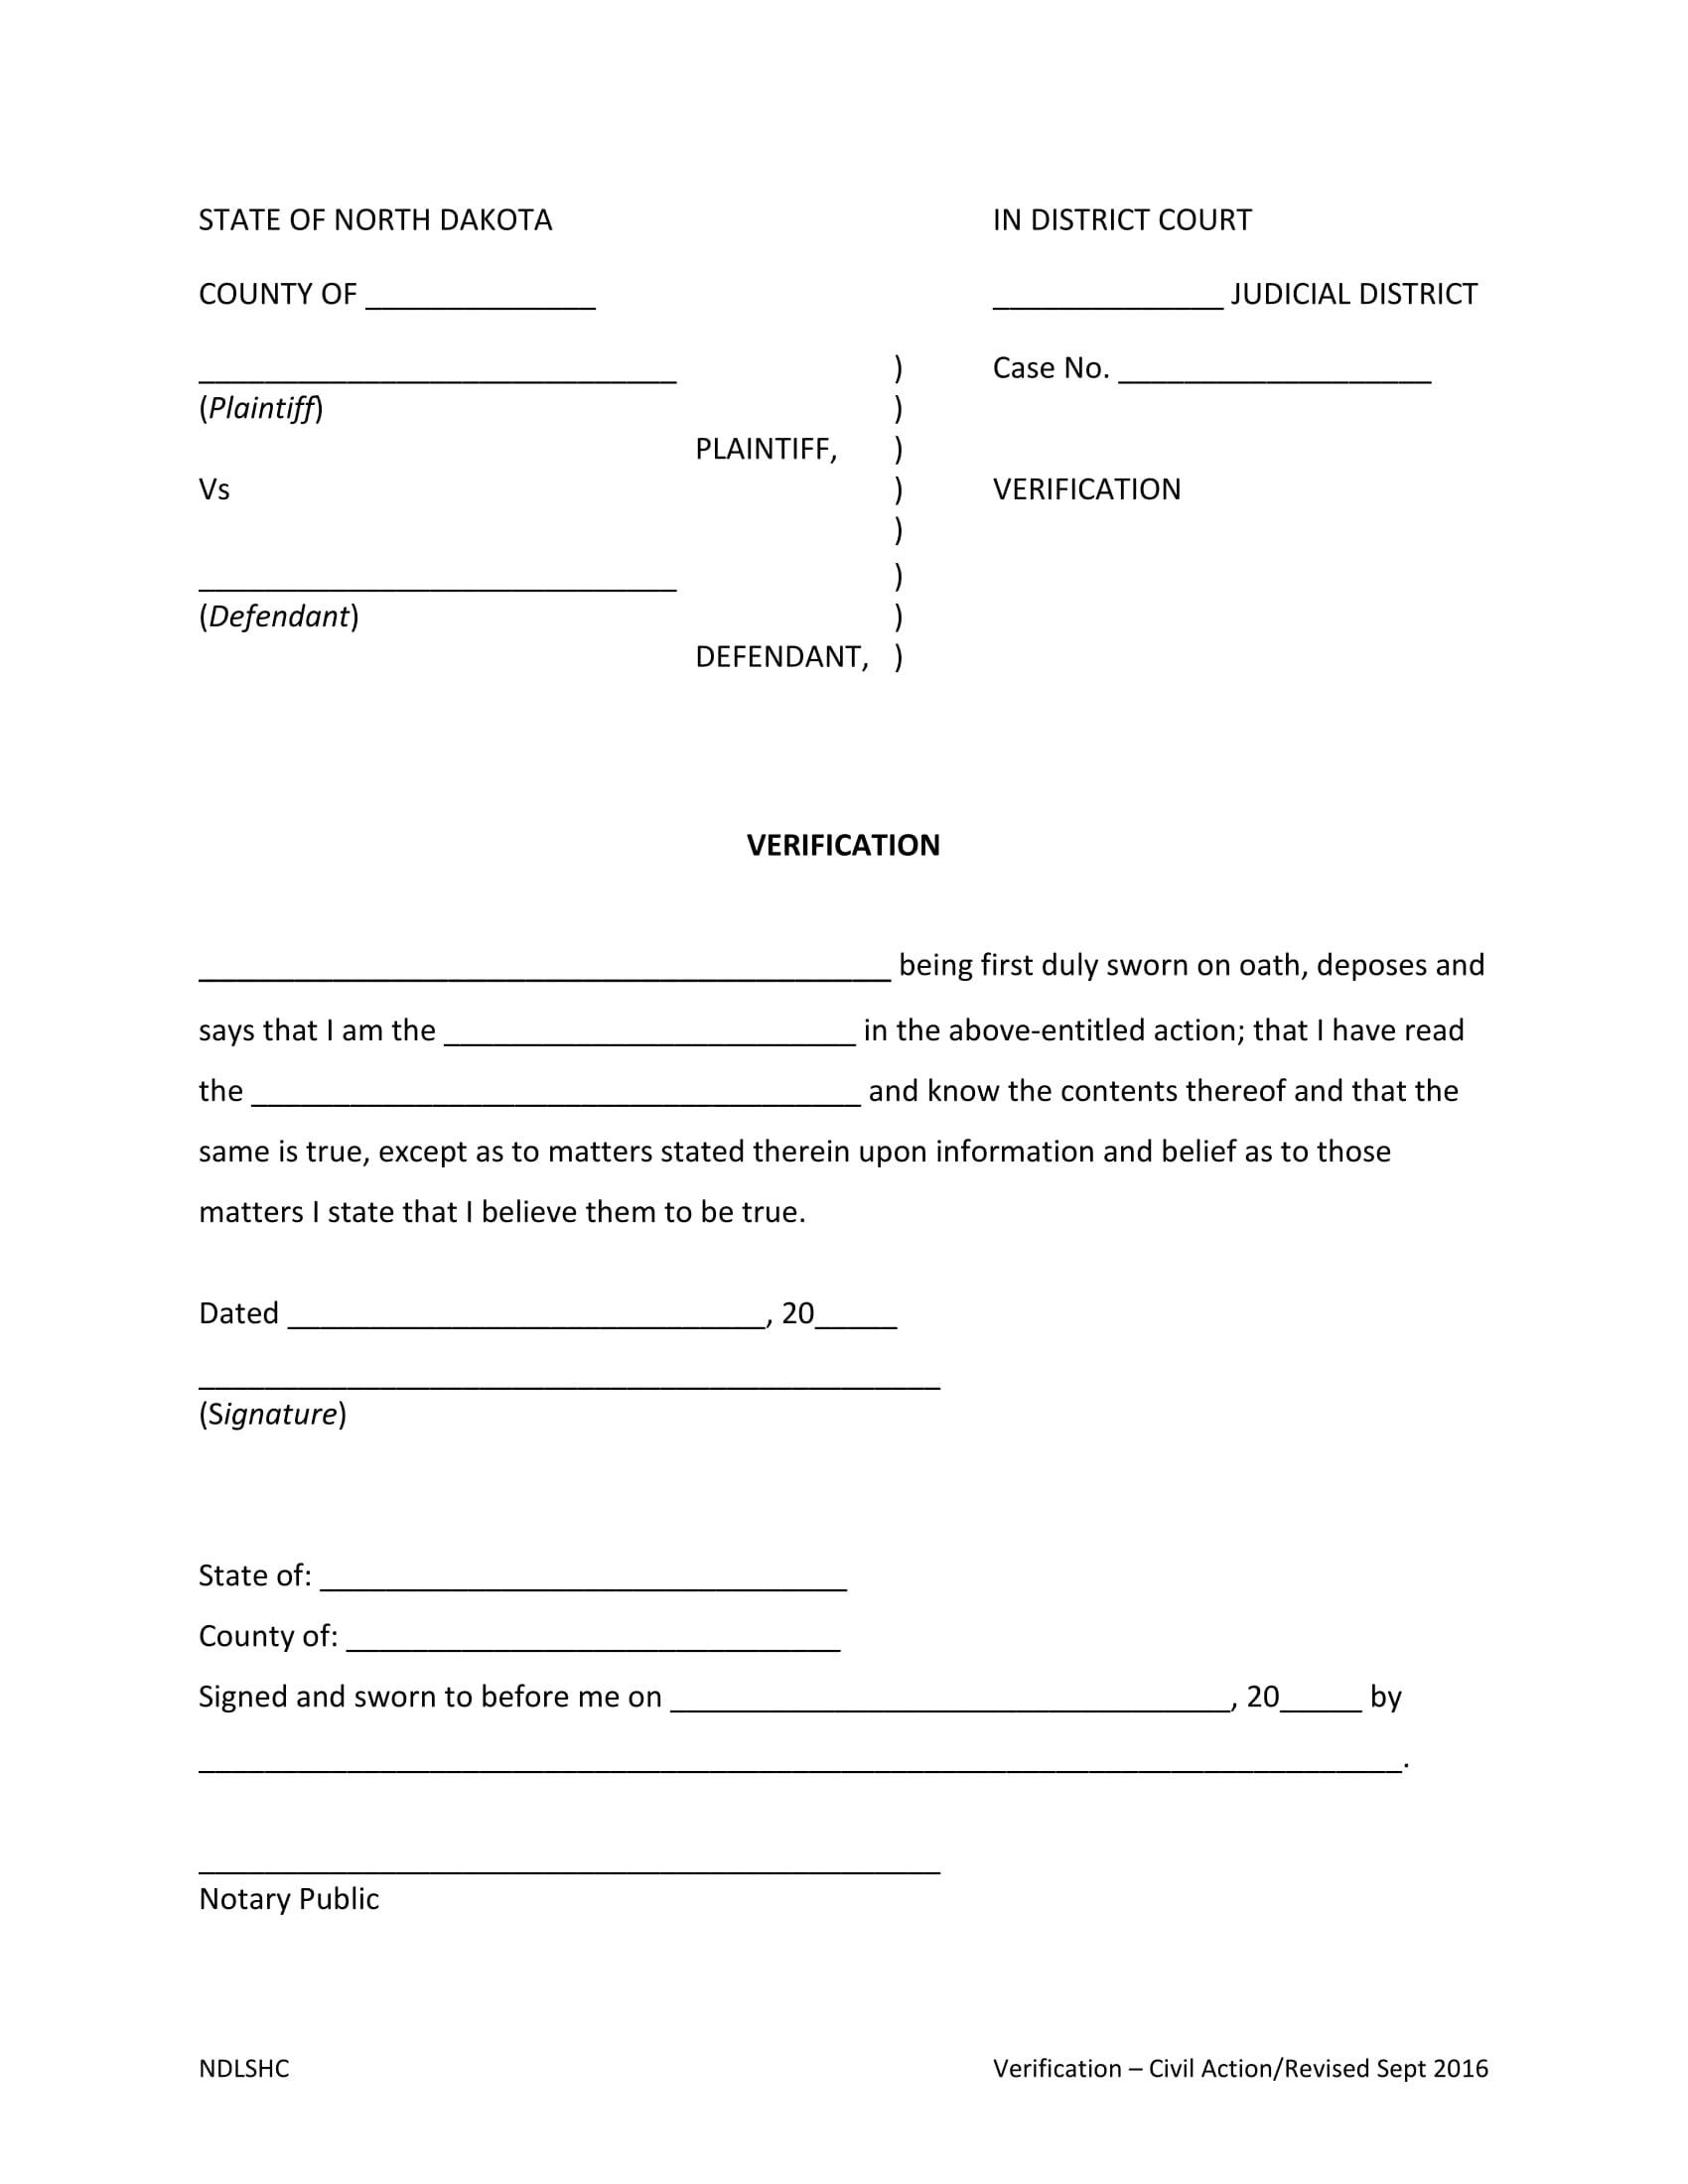 Notary Public Certificate California